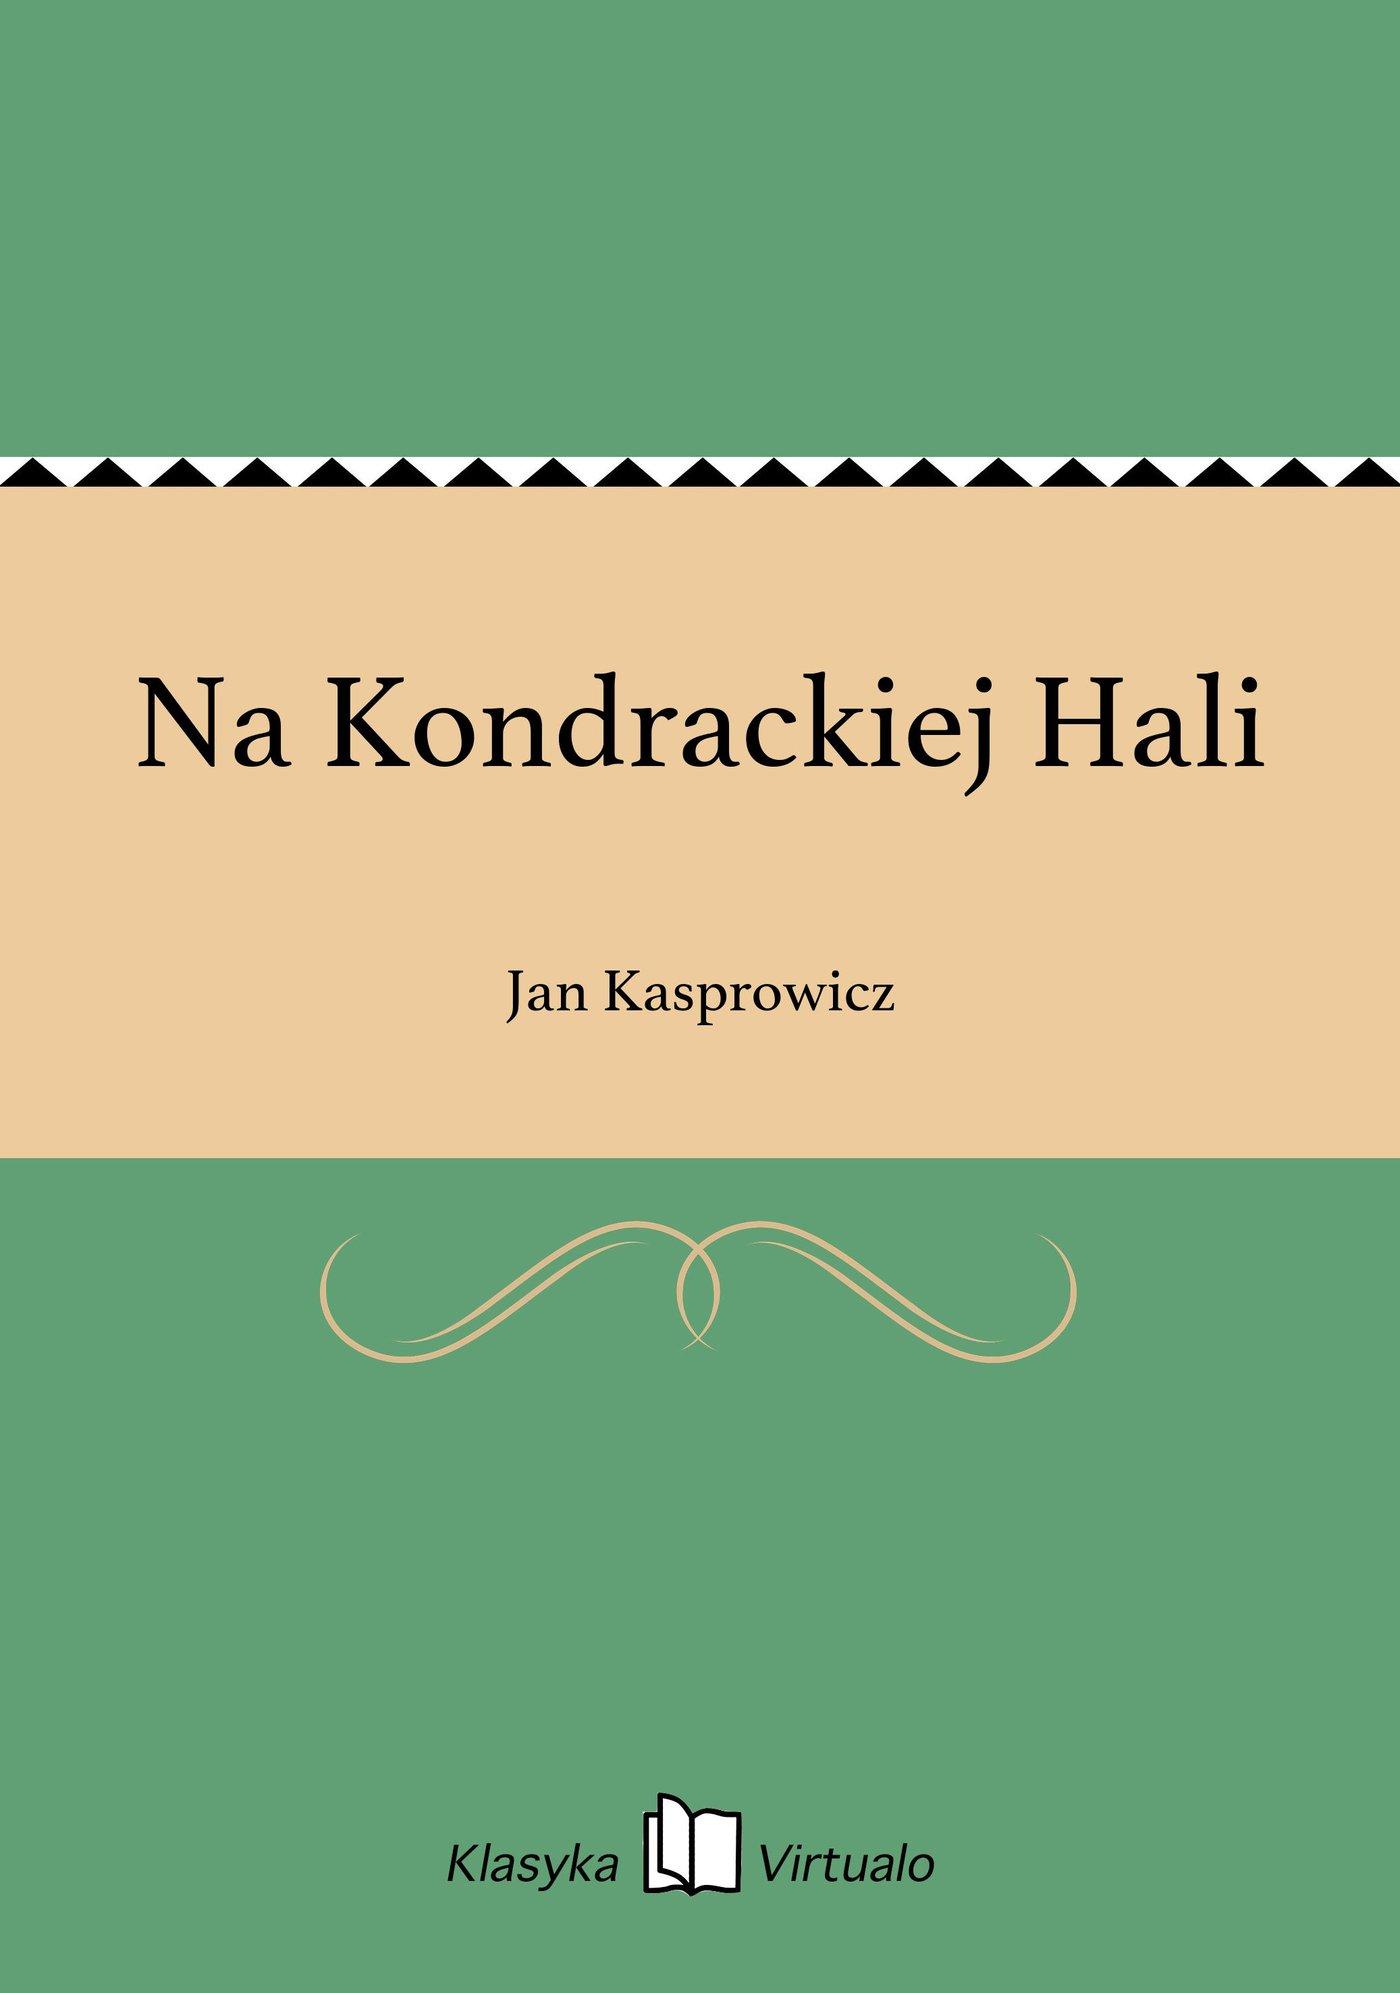 Na Kondrackiej Hali - Ebook (Książka na Kindle) do pobrania w formacie MOBI